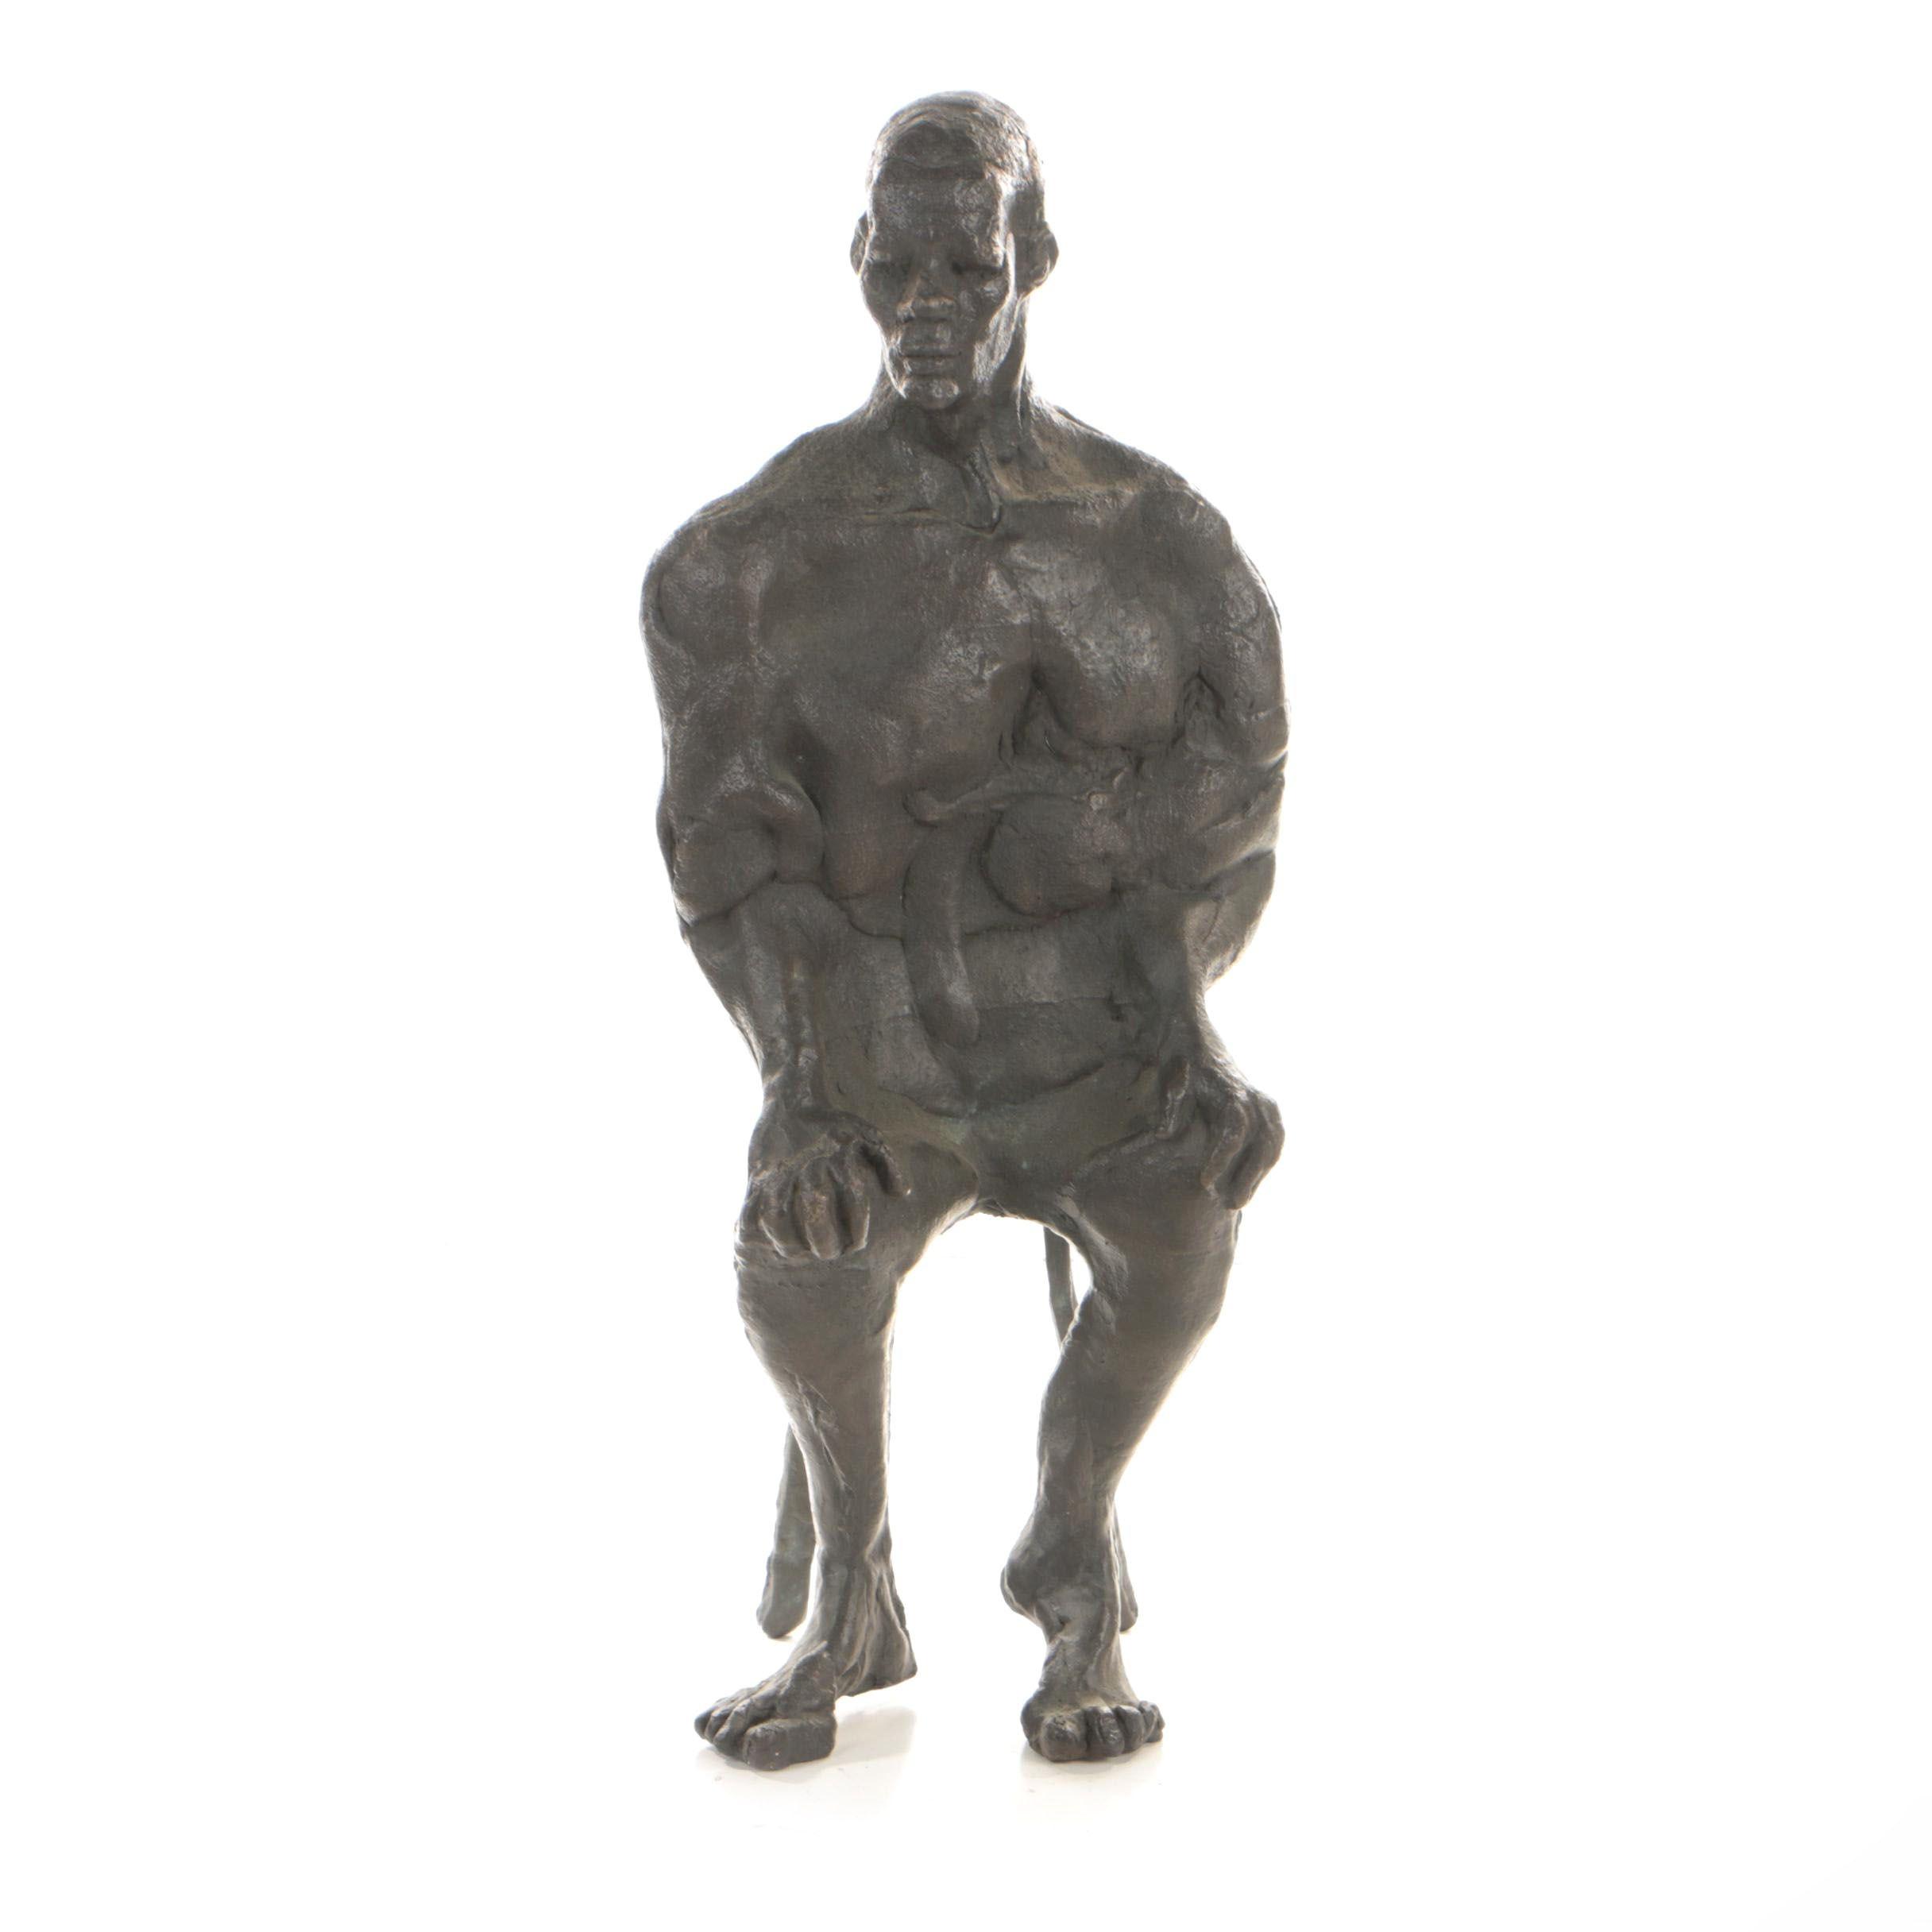 John Tuska Cast Bronze Sculpture of Seated Figure